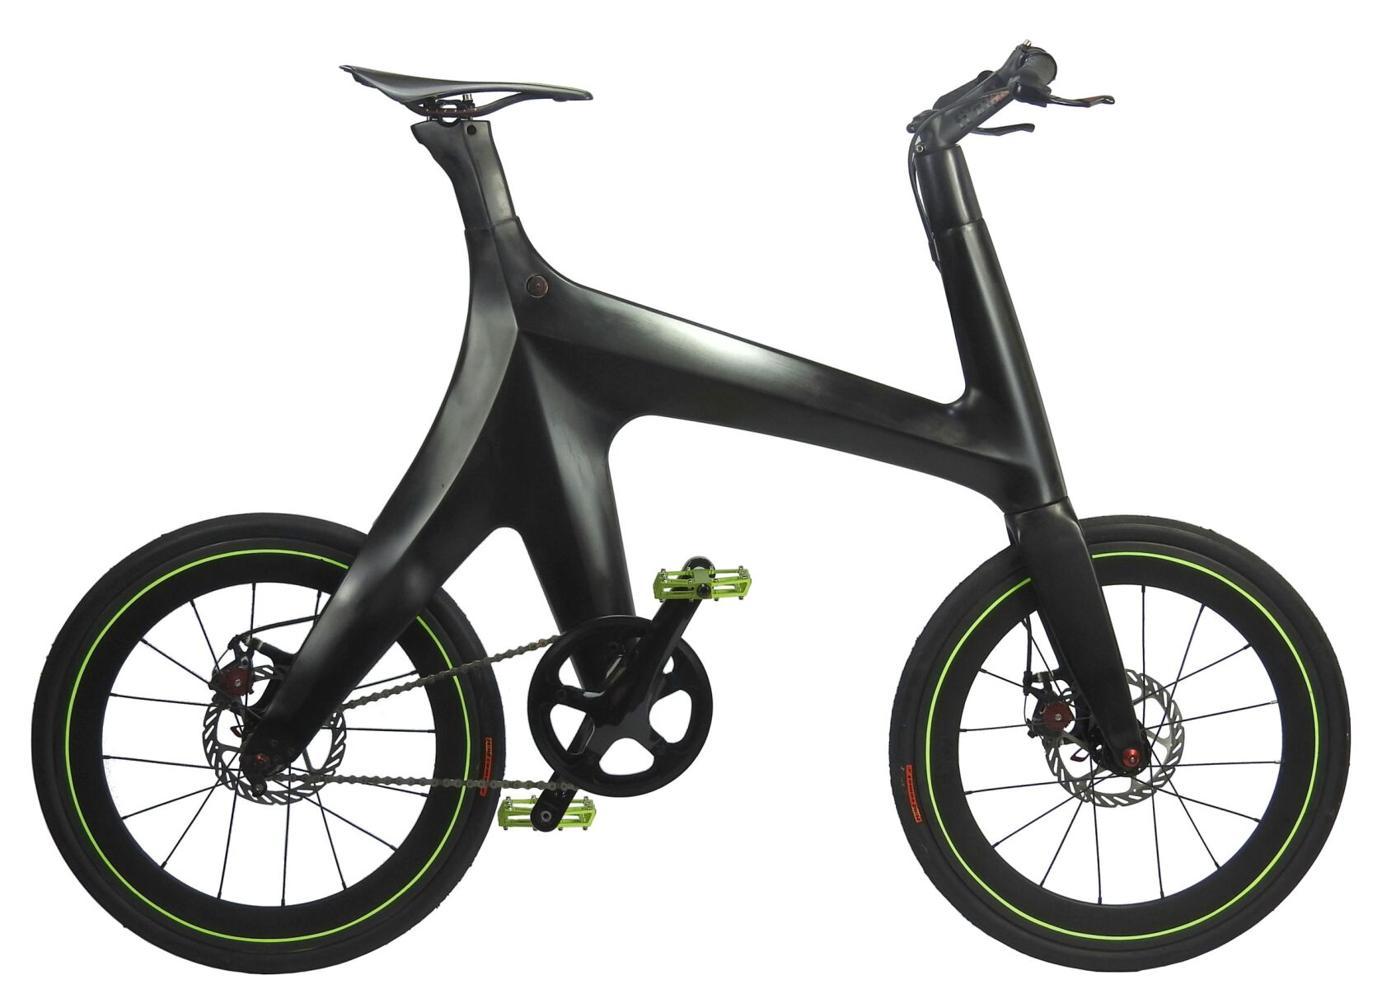 050521_MNS_MODA_bikes_001 Bram Moen Minimal Bike